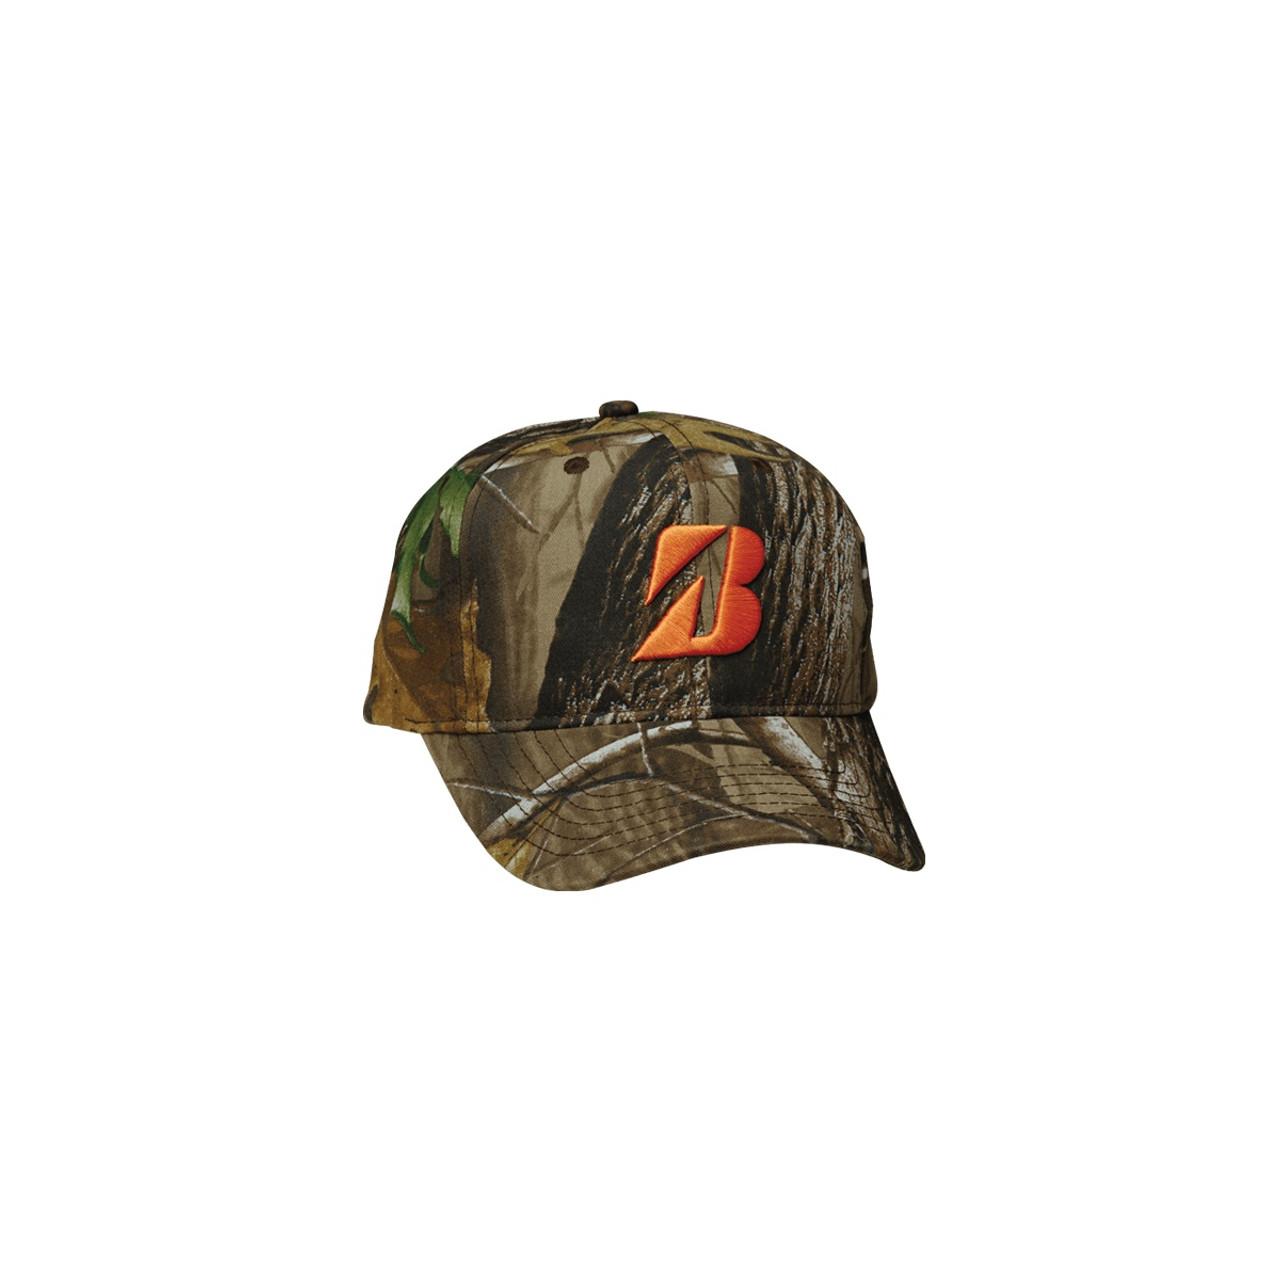 bridgestone golf realtree adjustable hat with orange logo